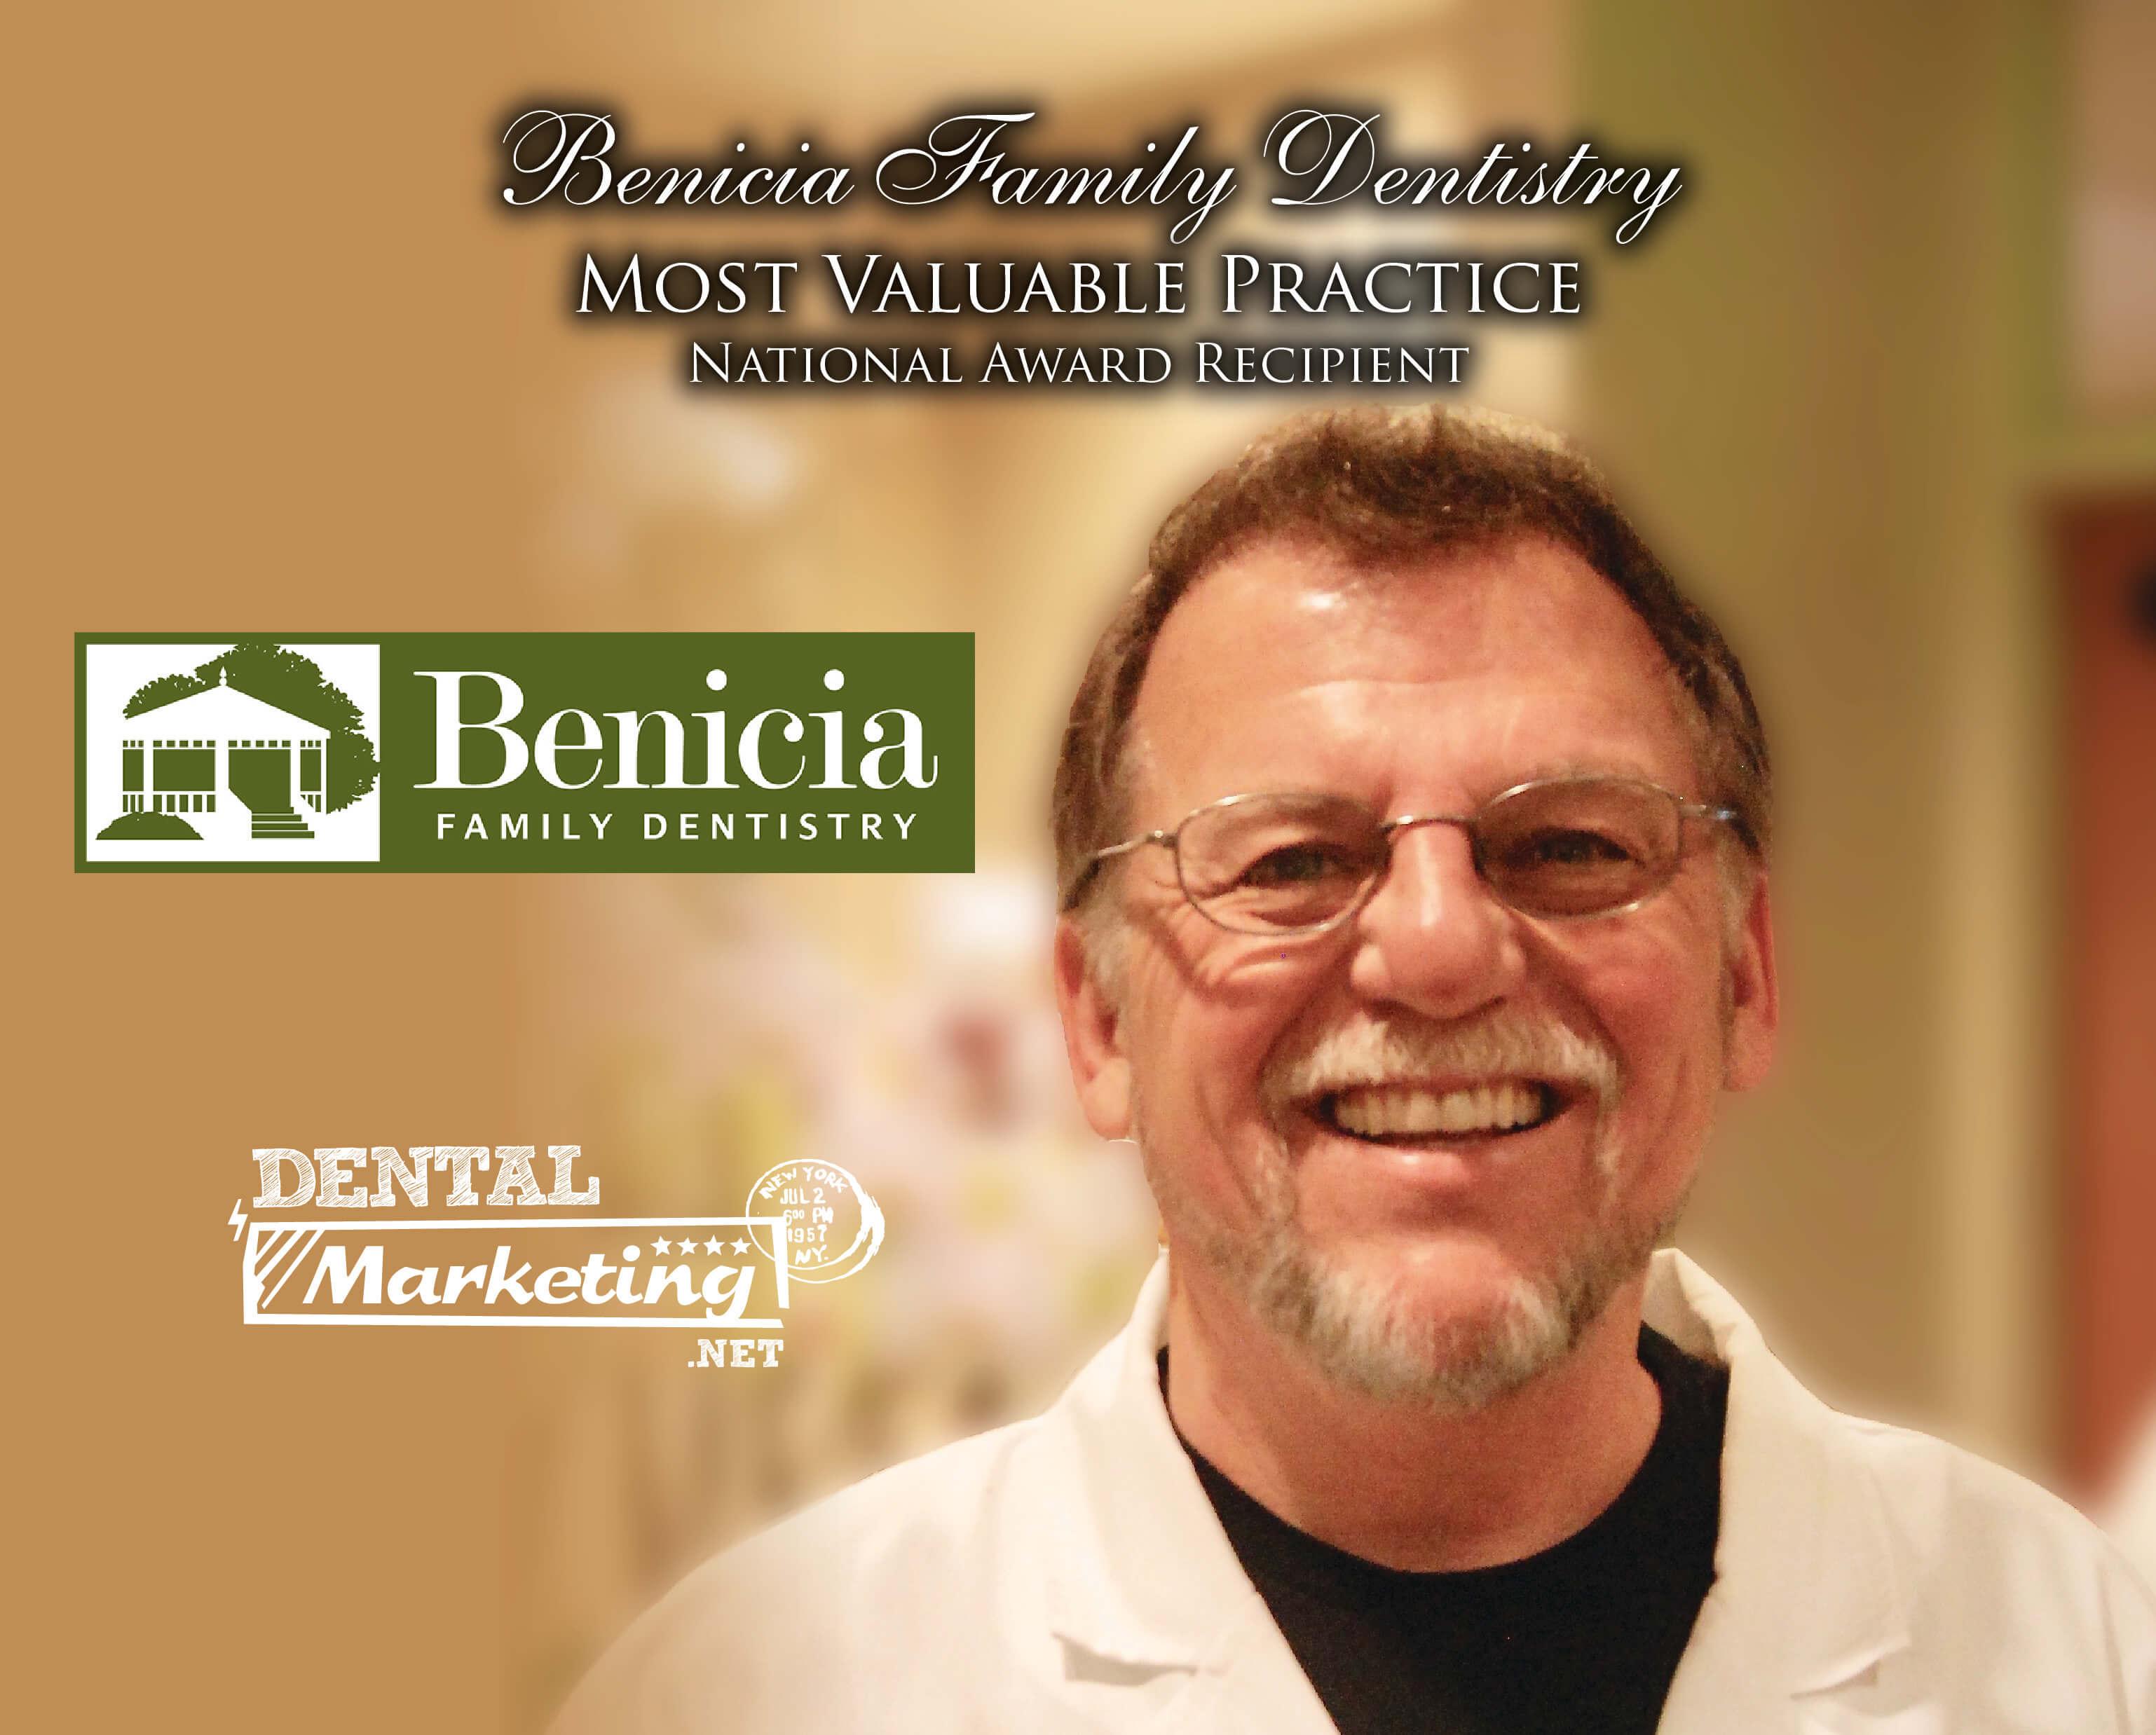 Benicia Family Dentistry